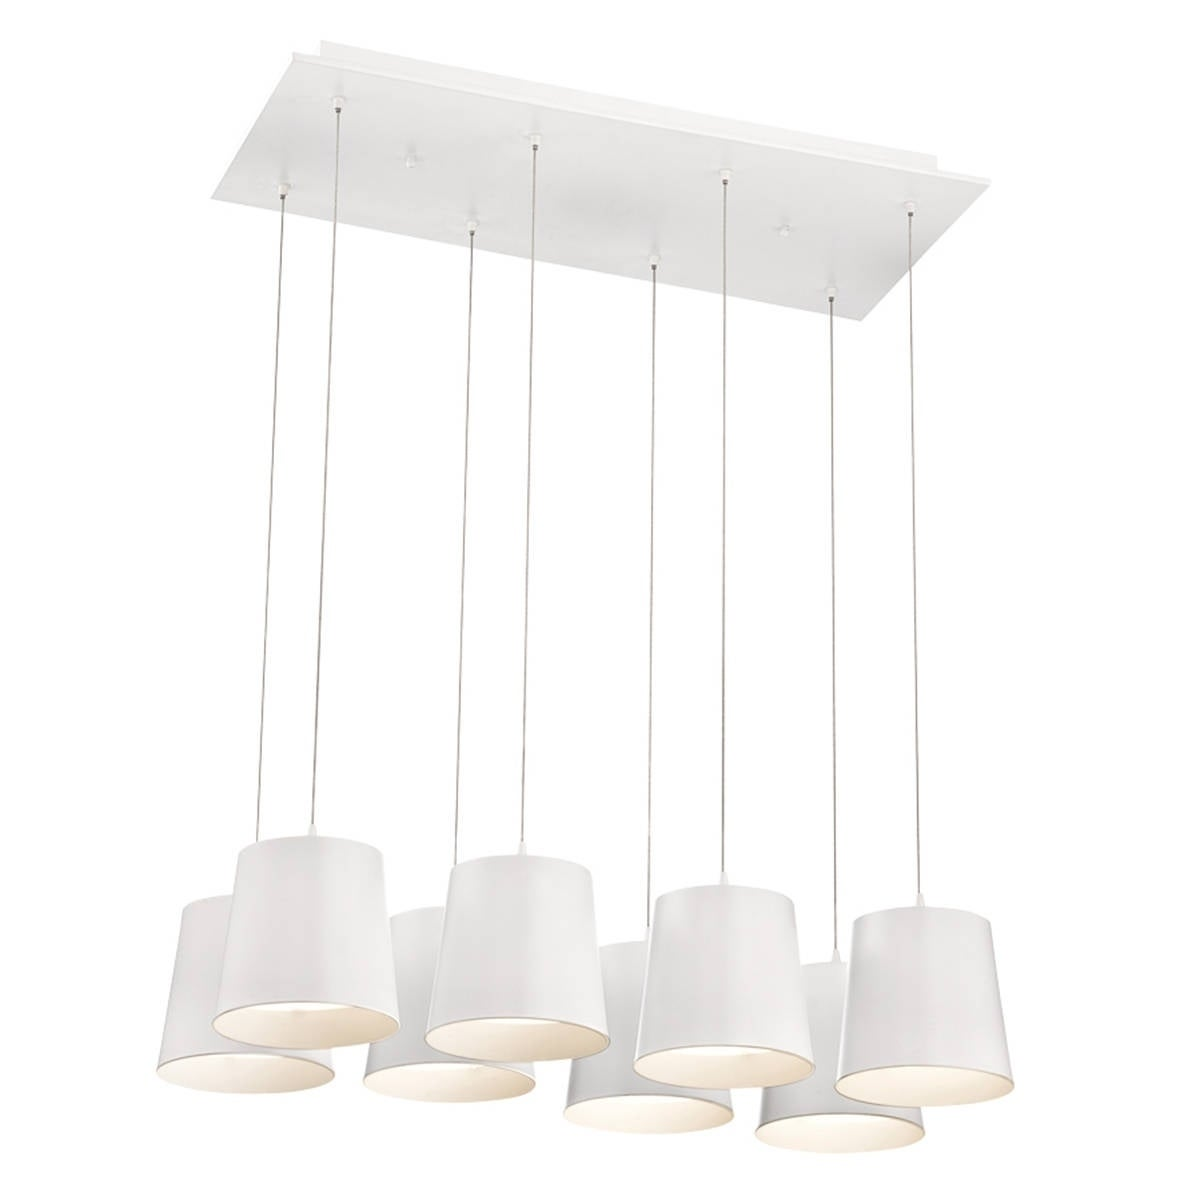 Eurofase borto 8 light led chandelier white finish 28163 015 eurofase borto 8 light led chandelier white finish 28163 015 free shipping today overstock 24093163 arubaitofo Images